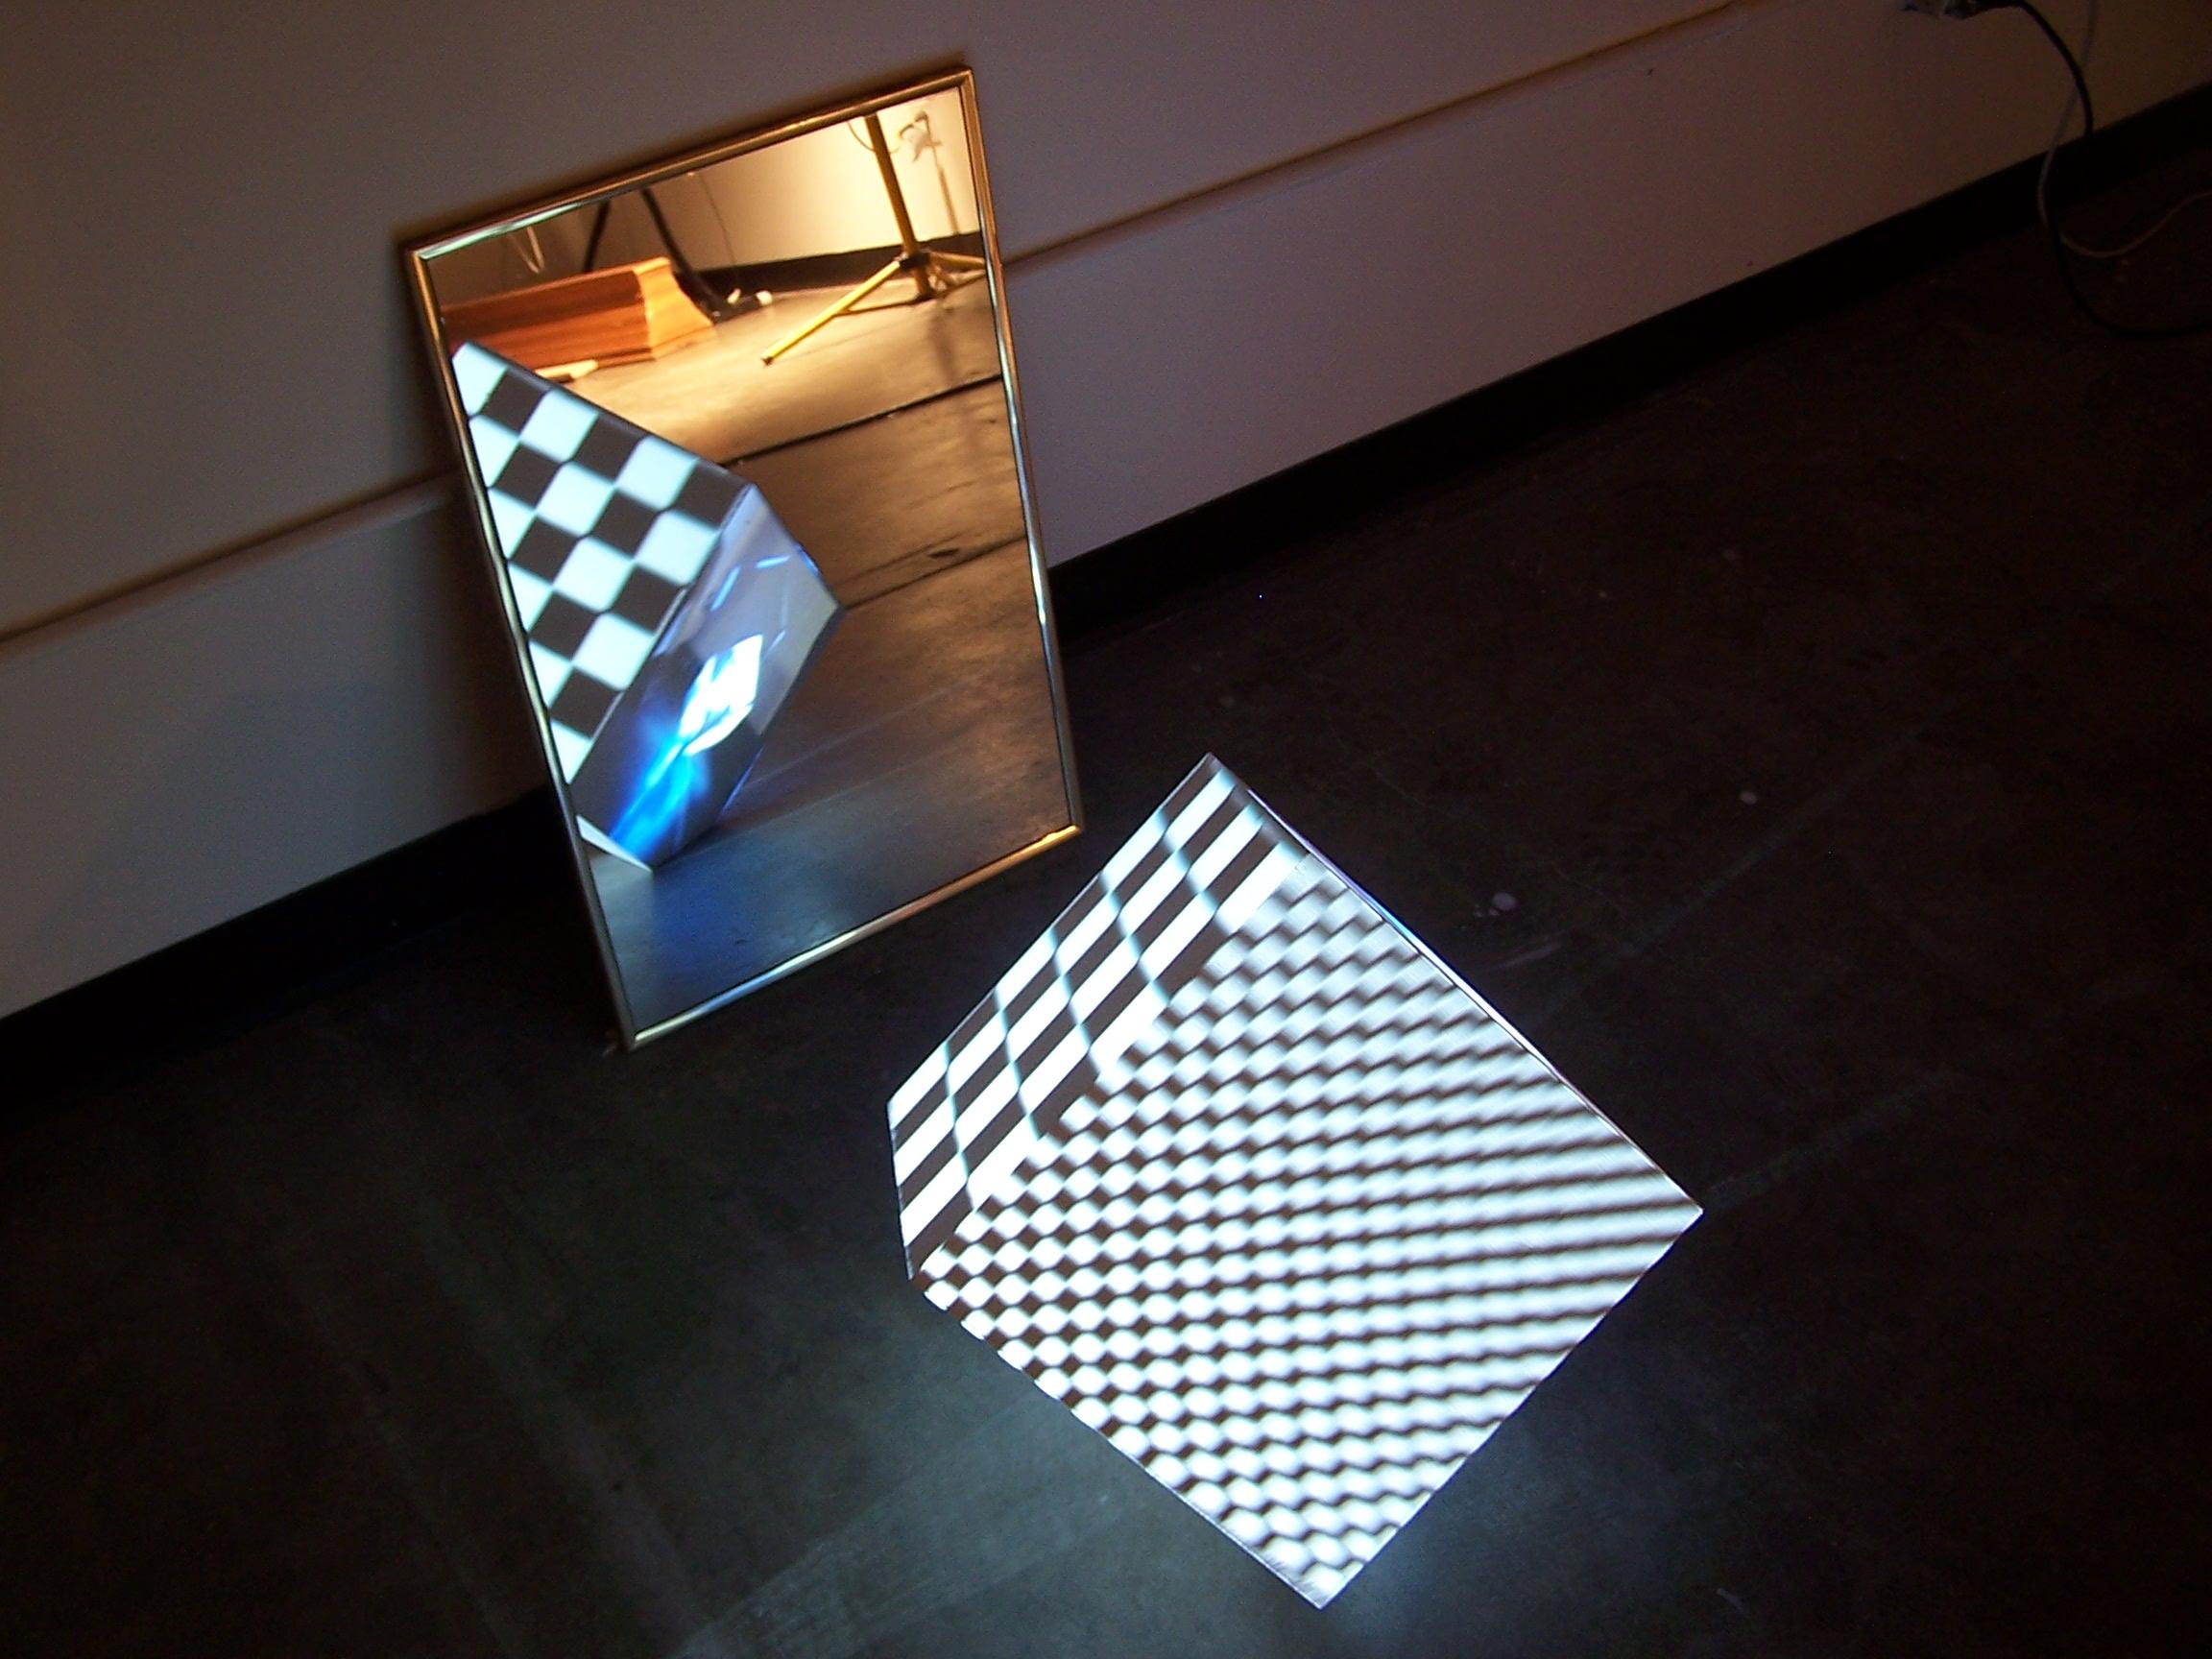 Cube Etude 1.0